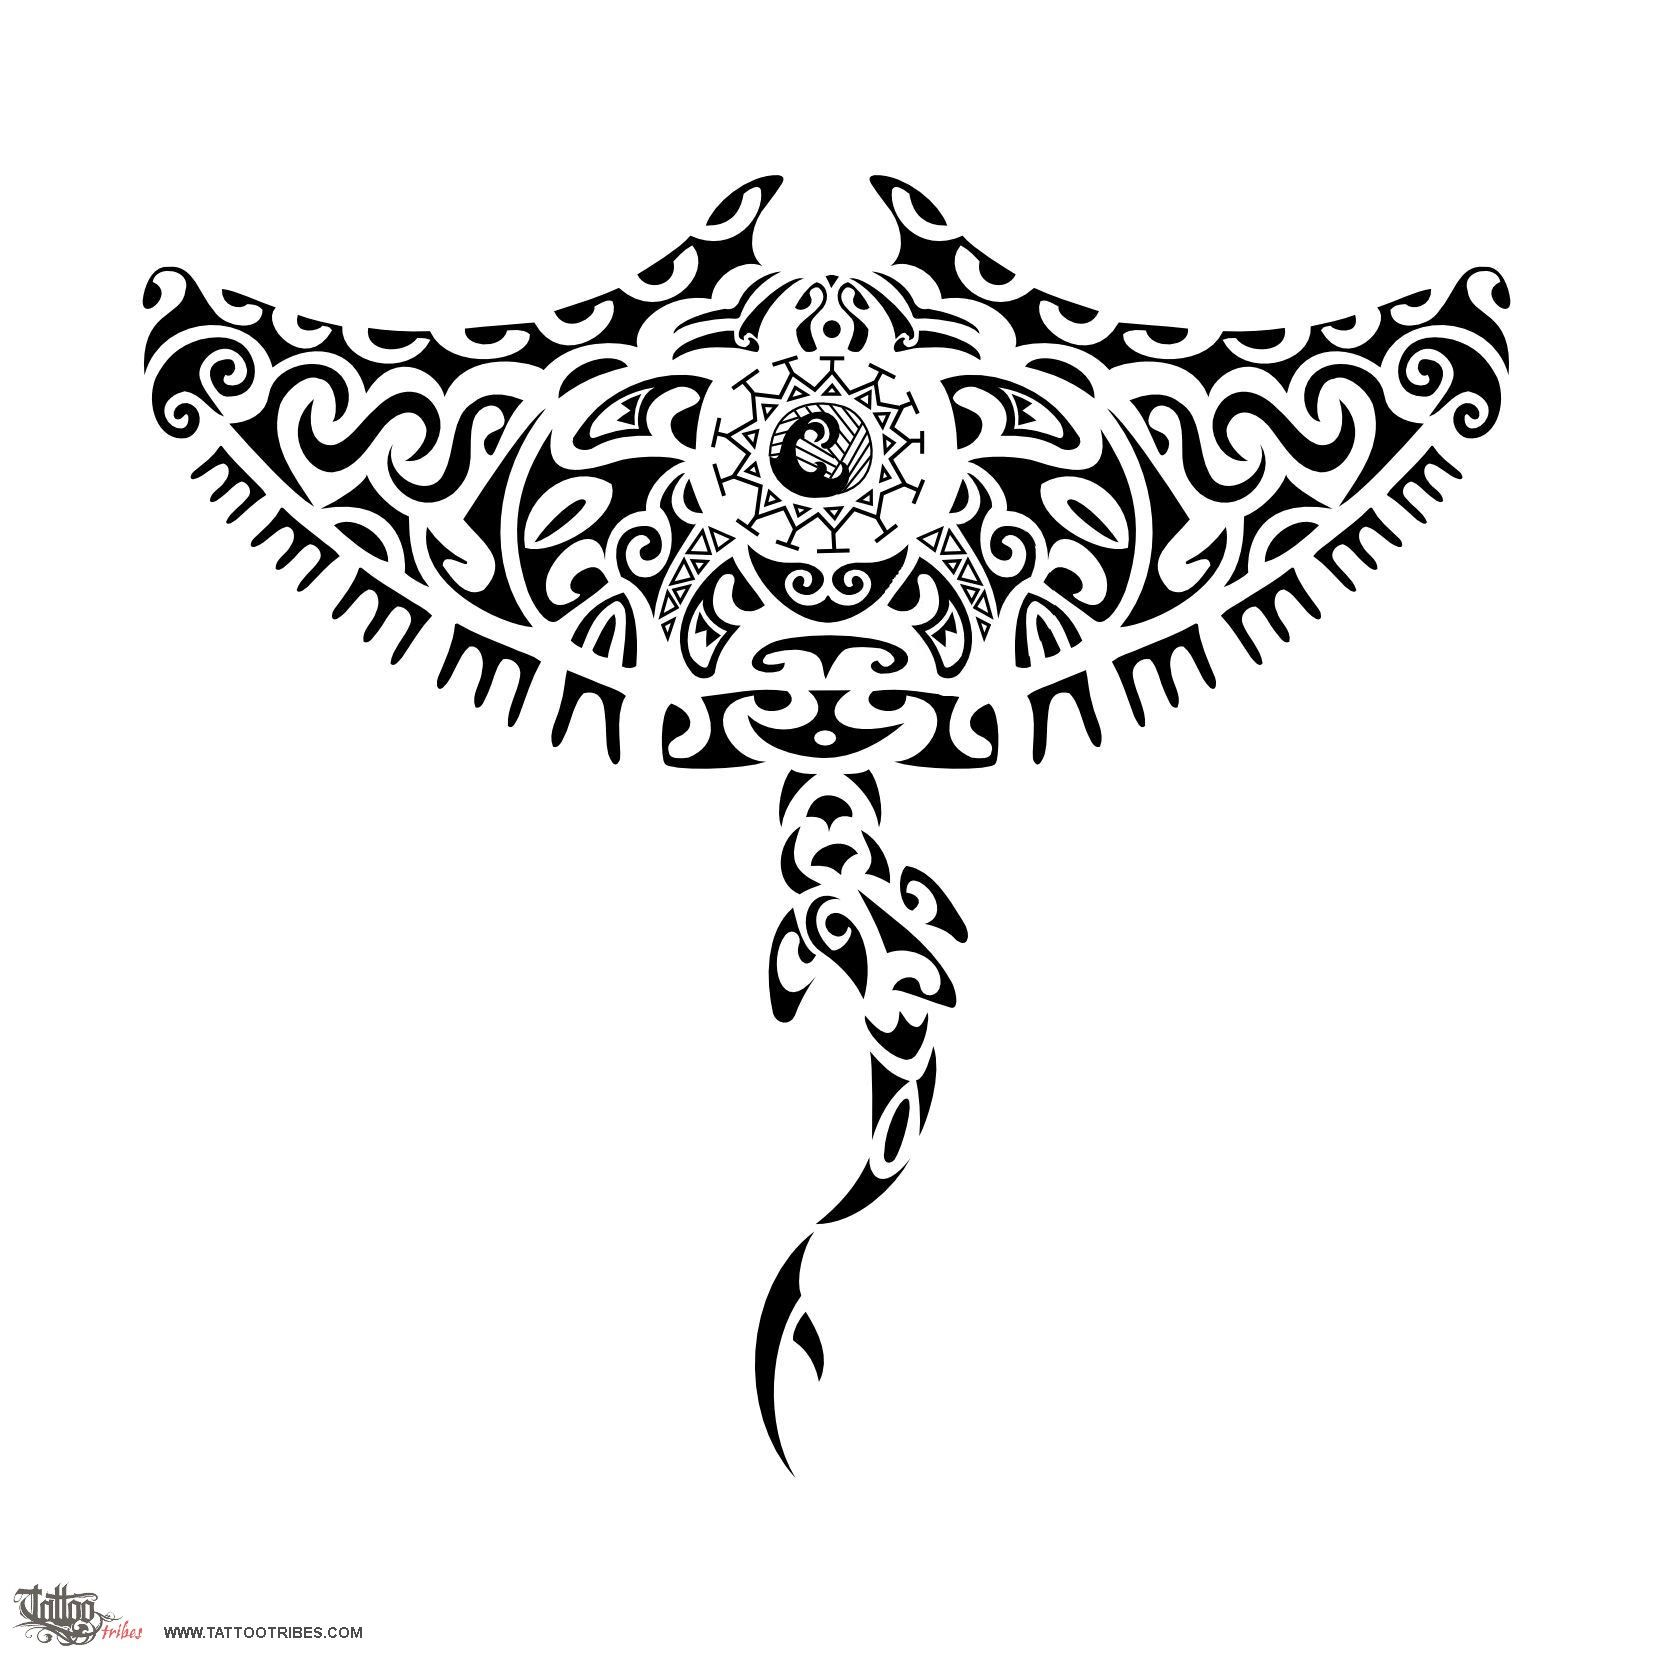 Tatuaggio Di Rawahi Oltreoceano Tattoo Custom Tattoo Designs On - Dibujos-maoris